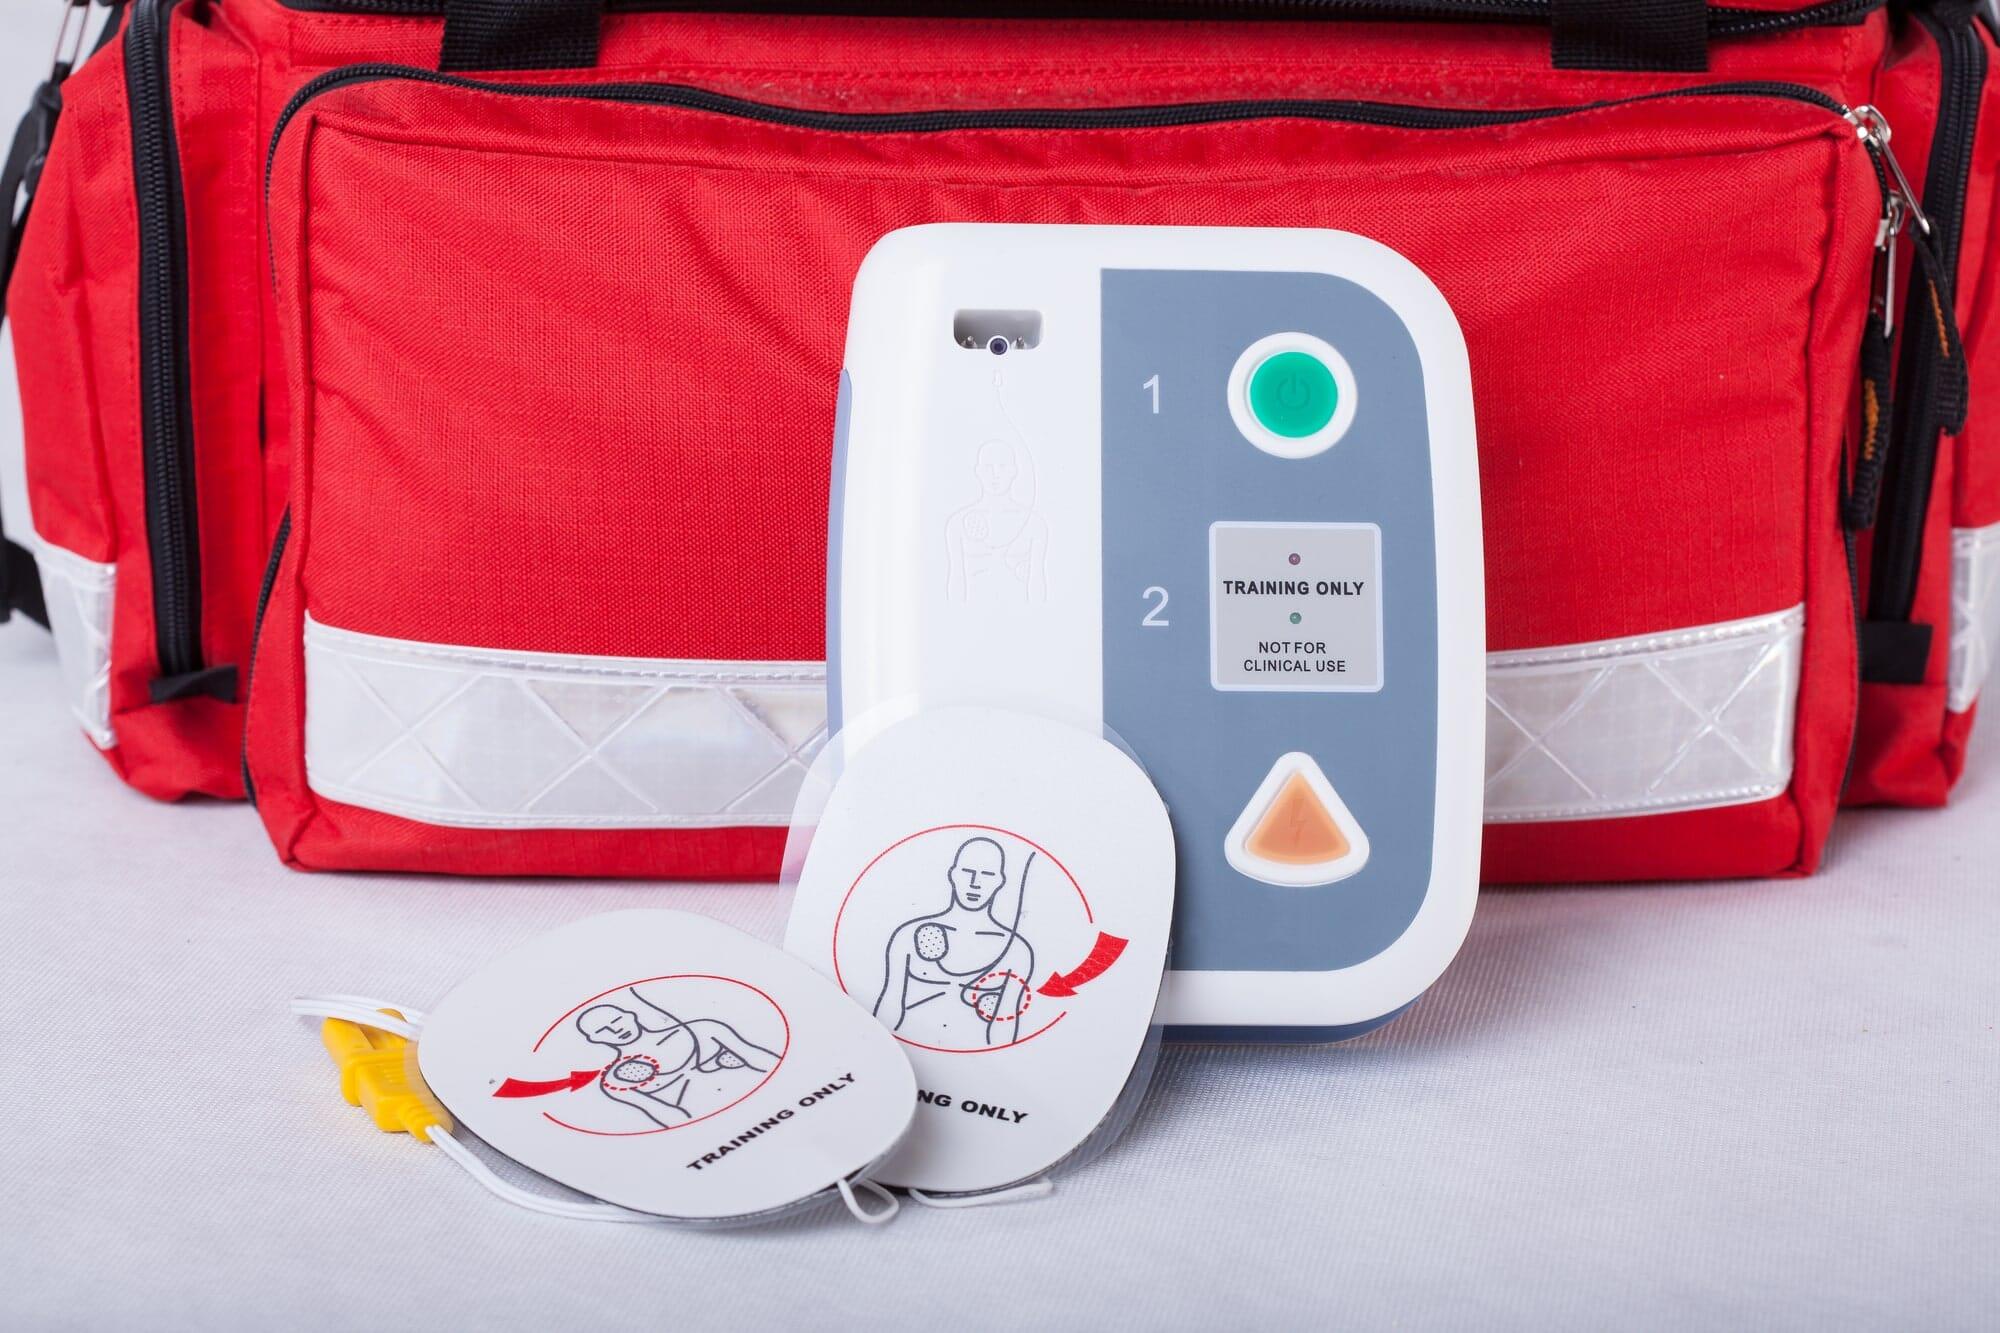 How much do defibrillators cost